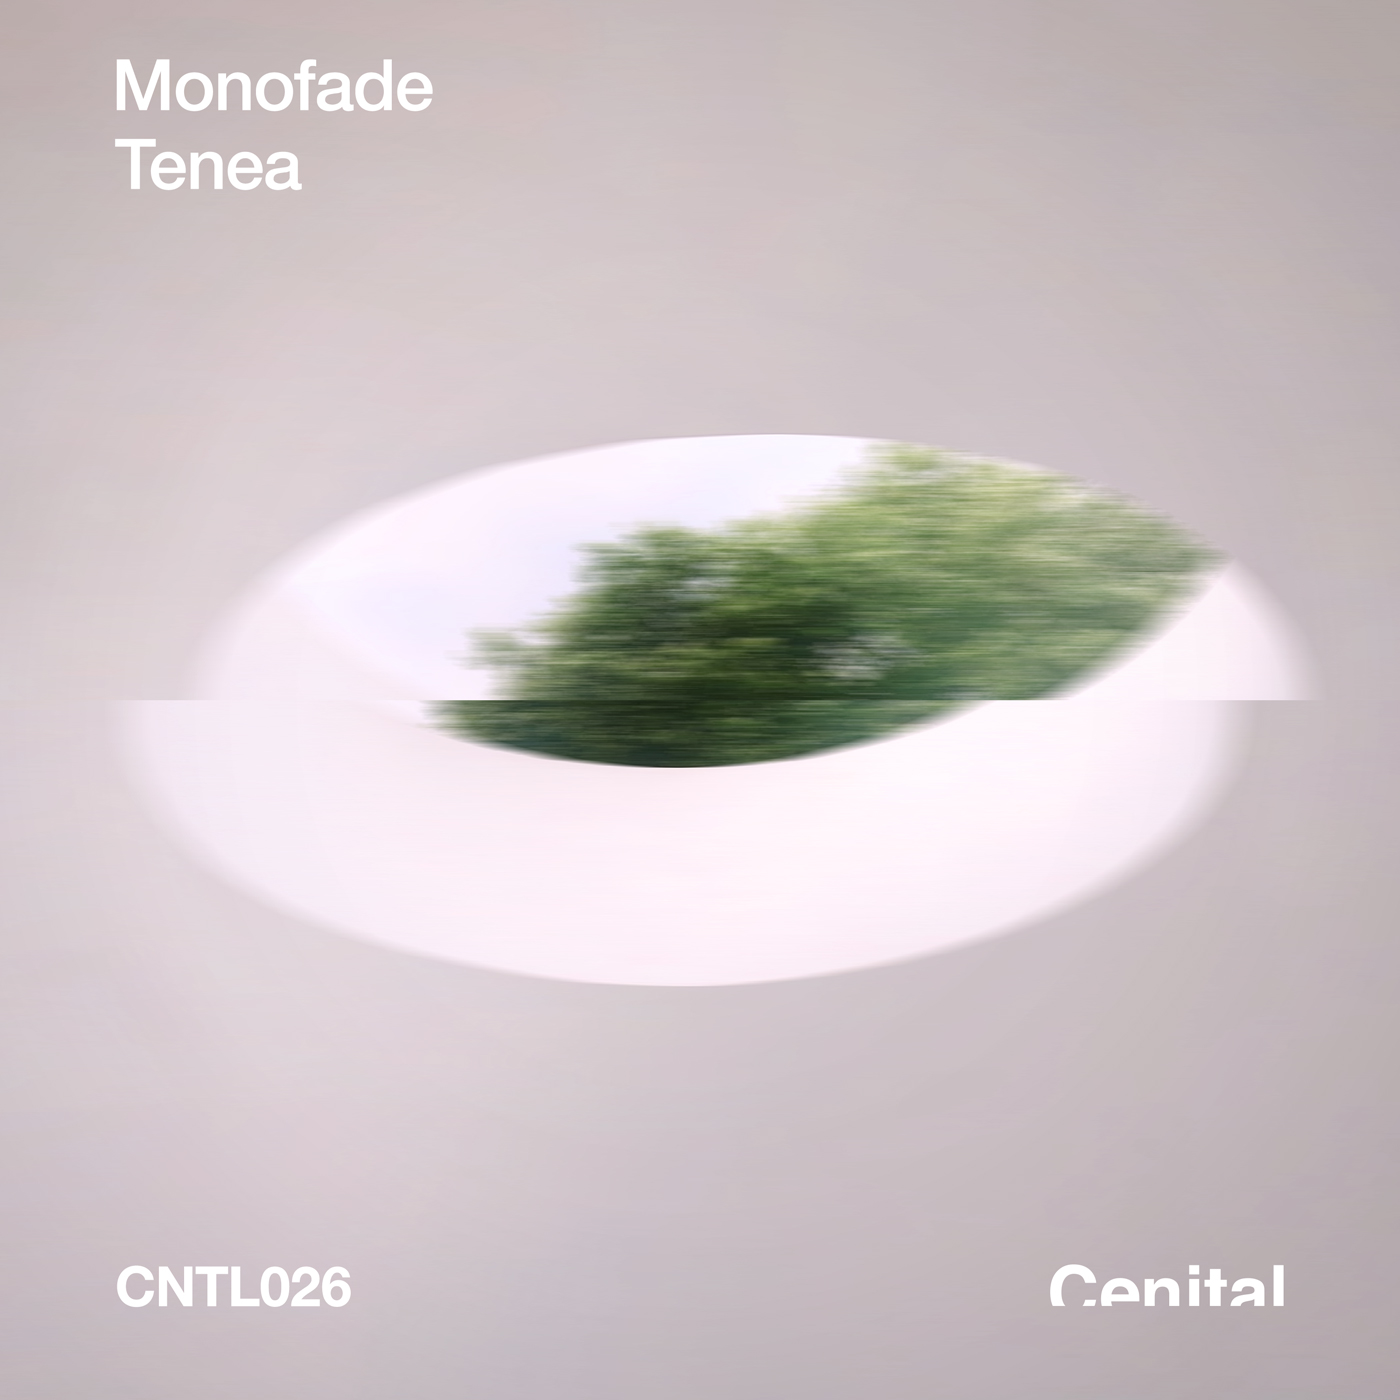 CNTL026